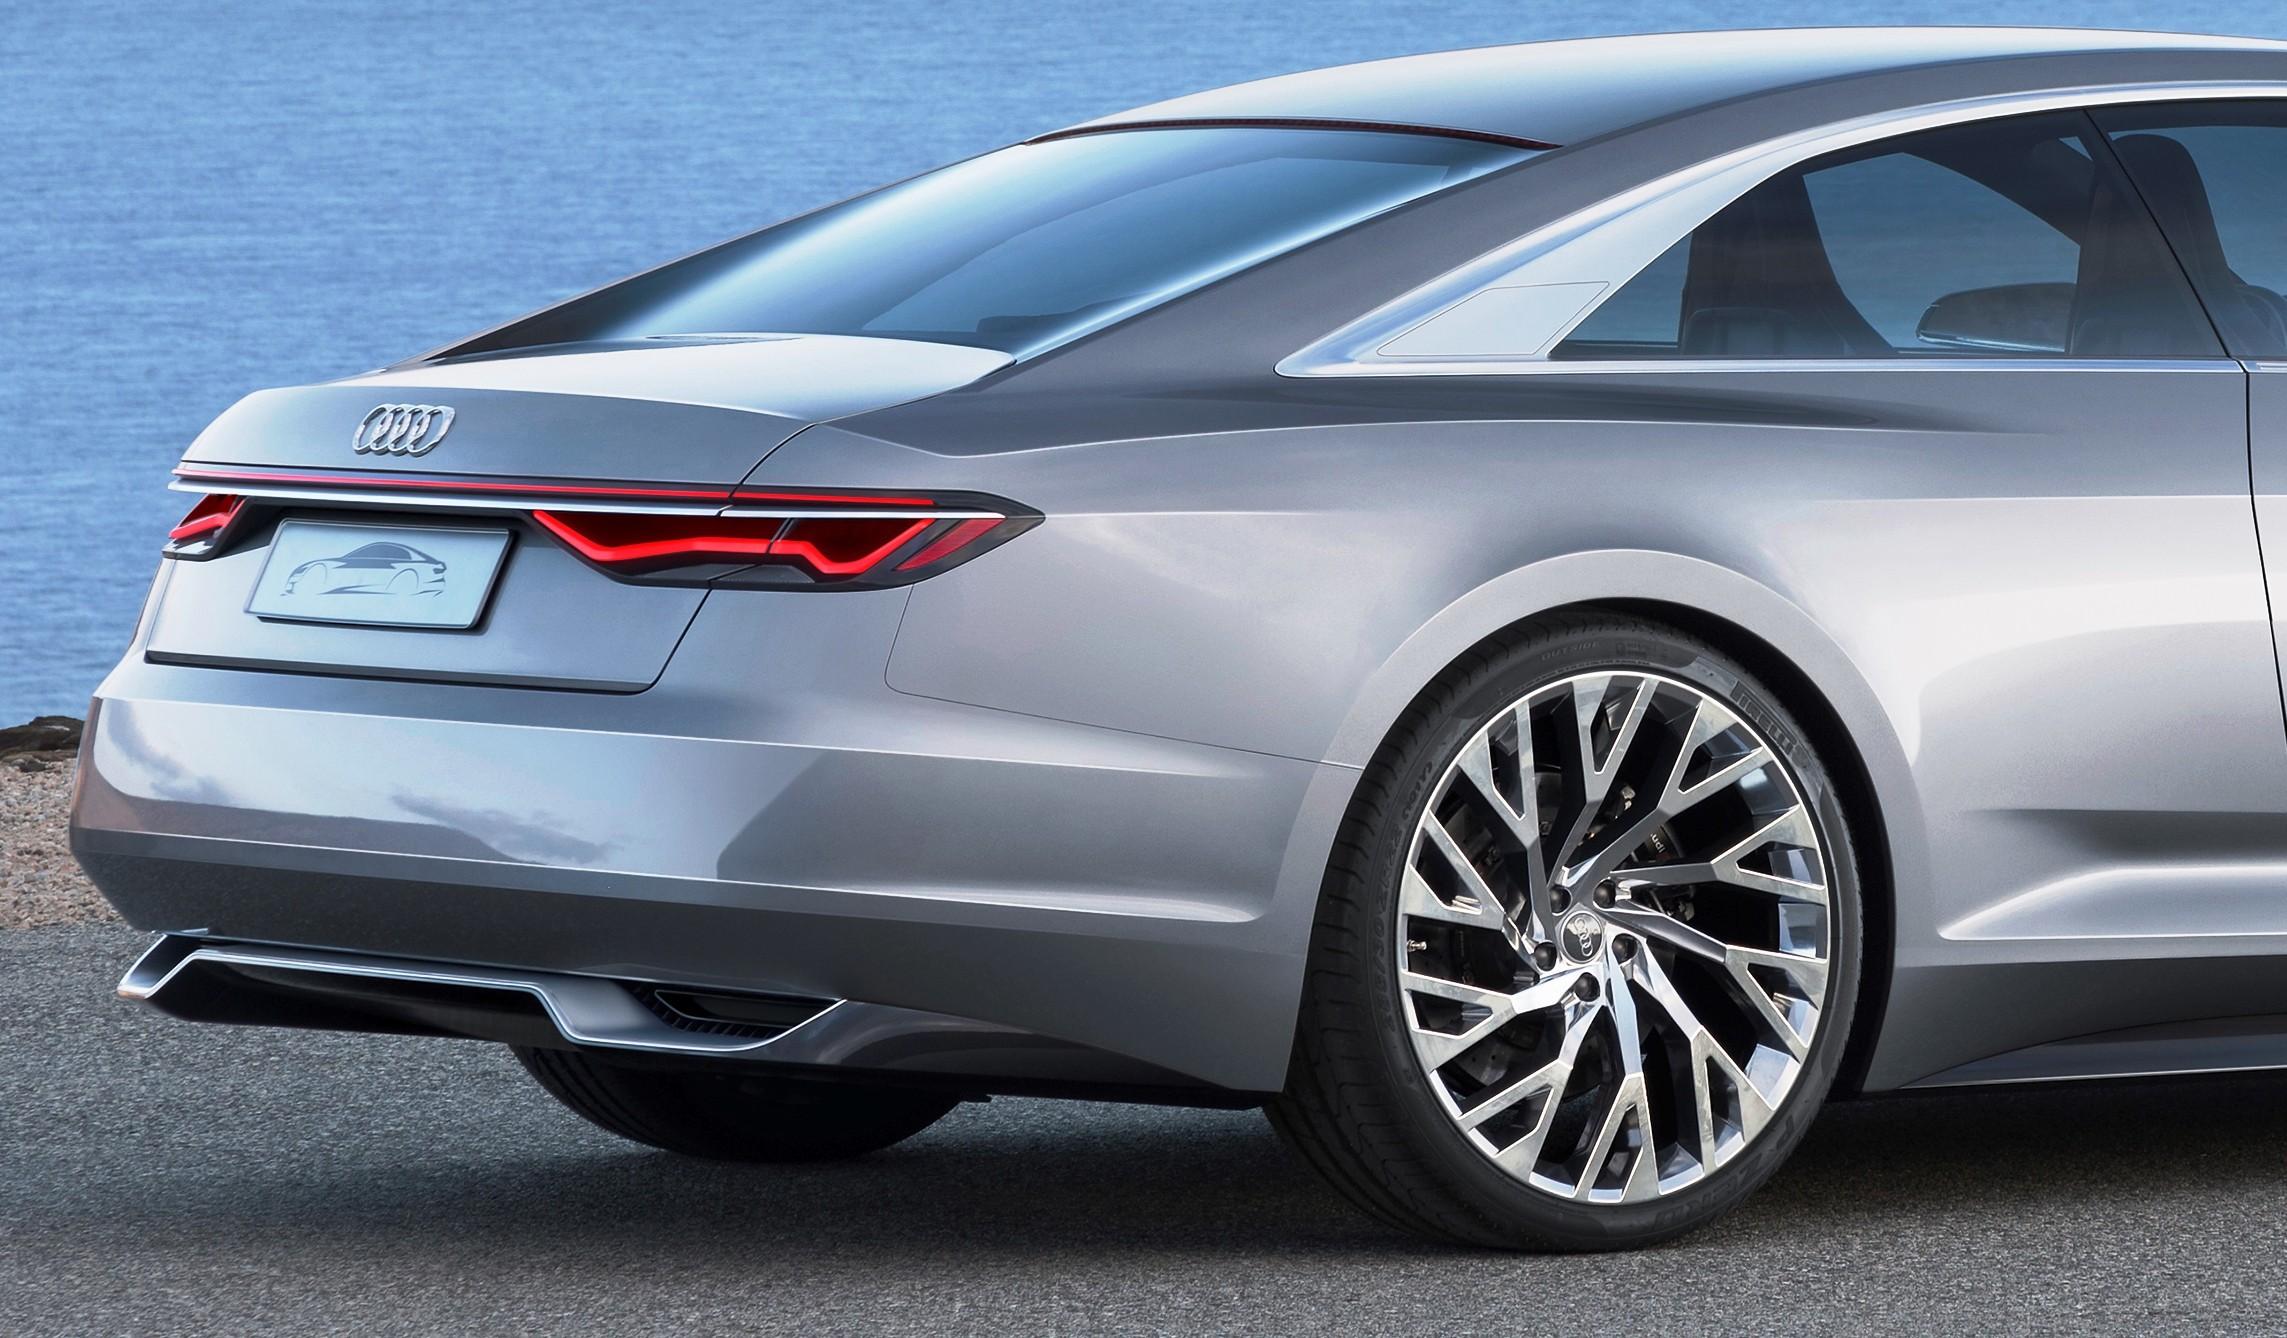 2014 Audi Prologue is Worst of LA 2014 23